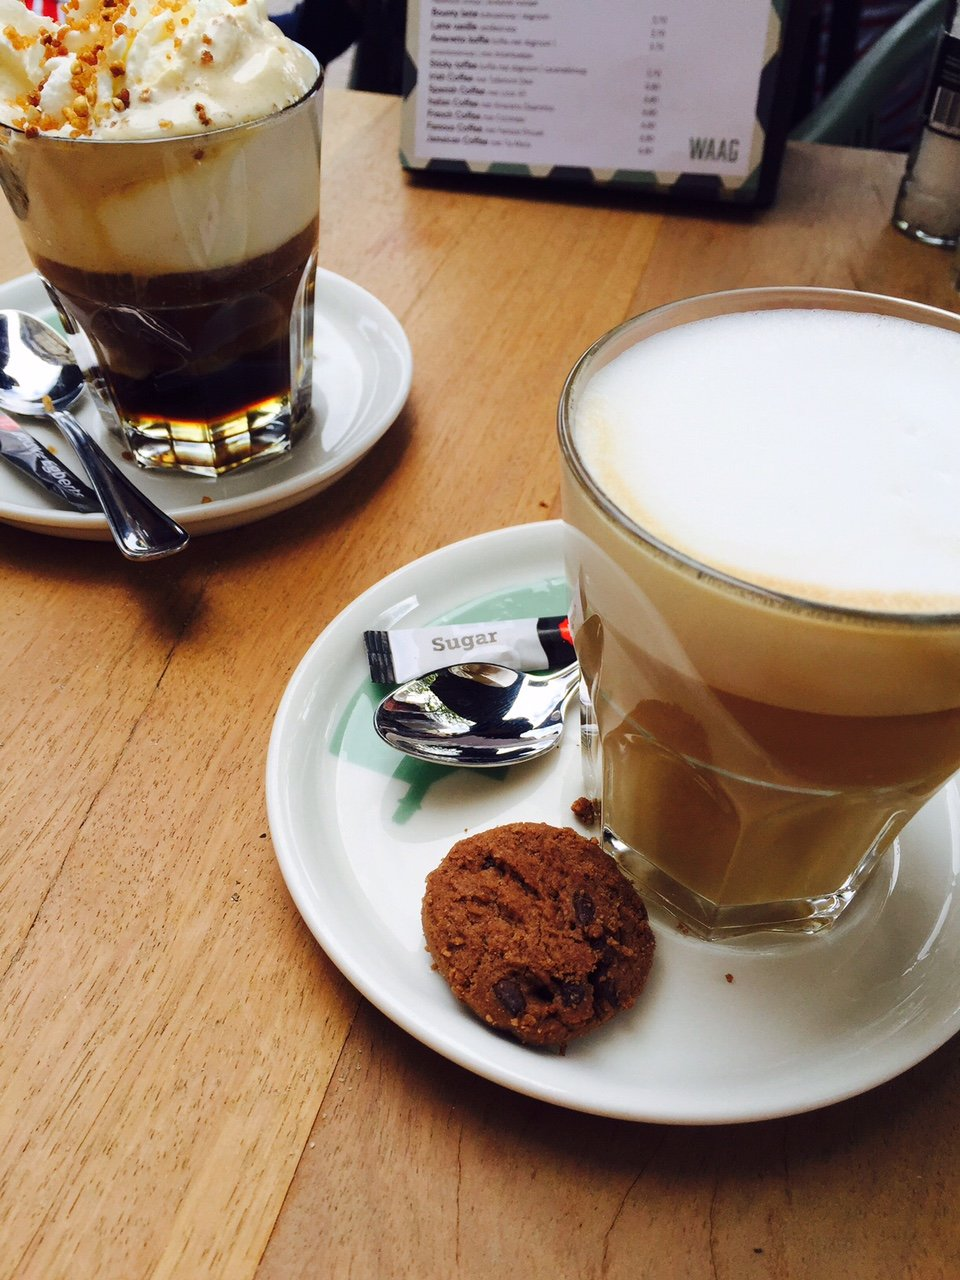 Verwenkoffie De waag leiden Foodblog Foodinista